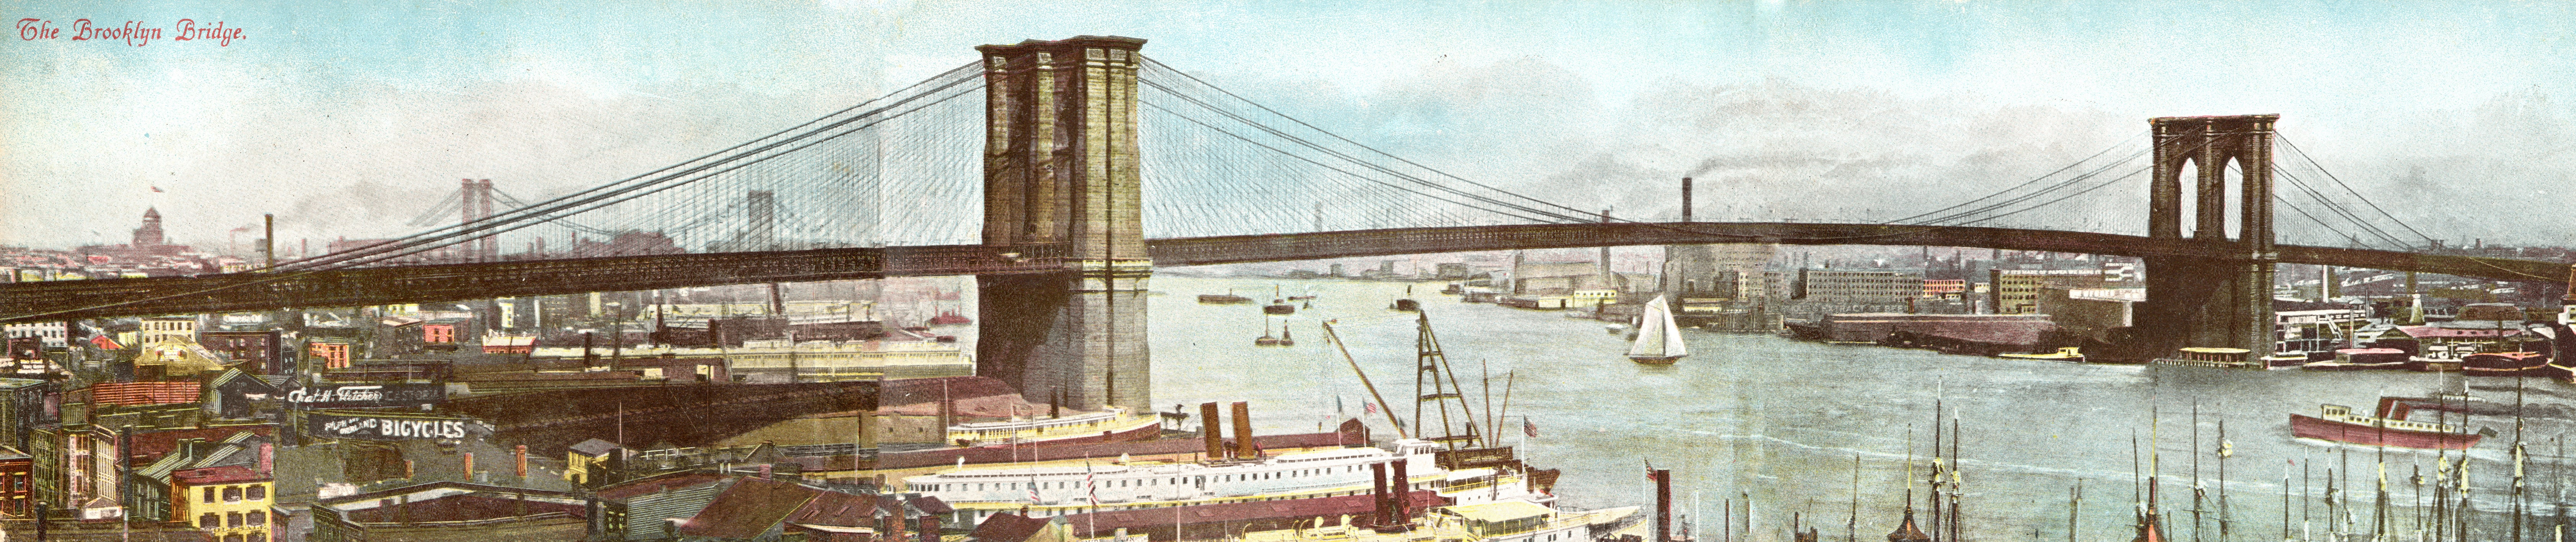 Vintage postcard of Brooklyn Bridge